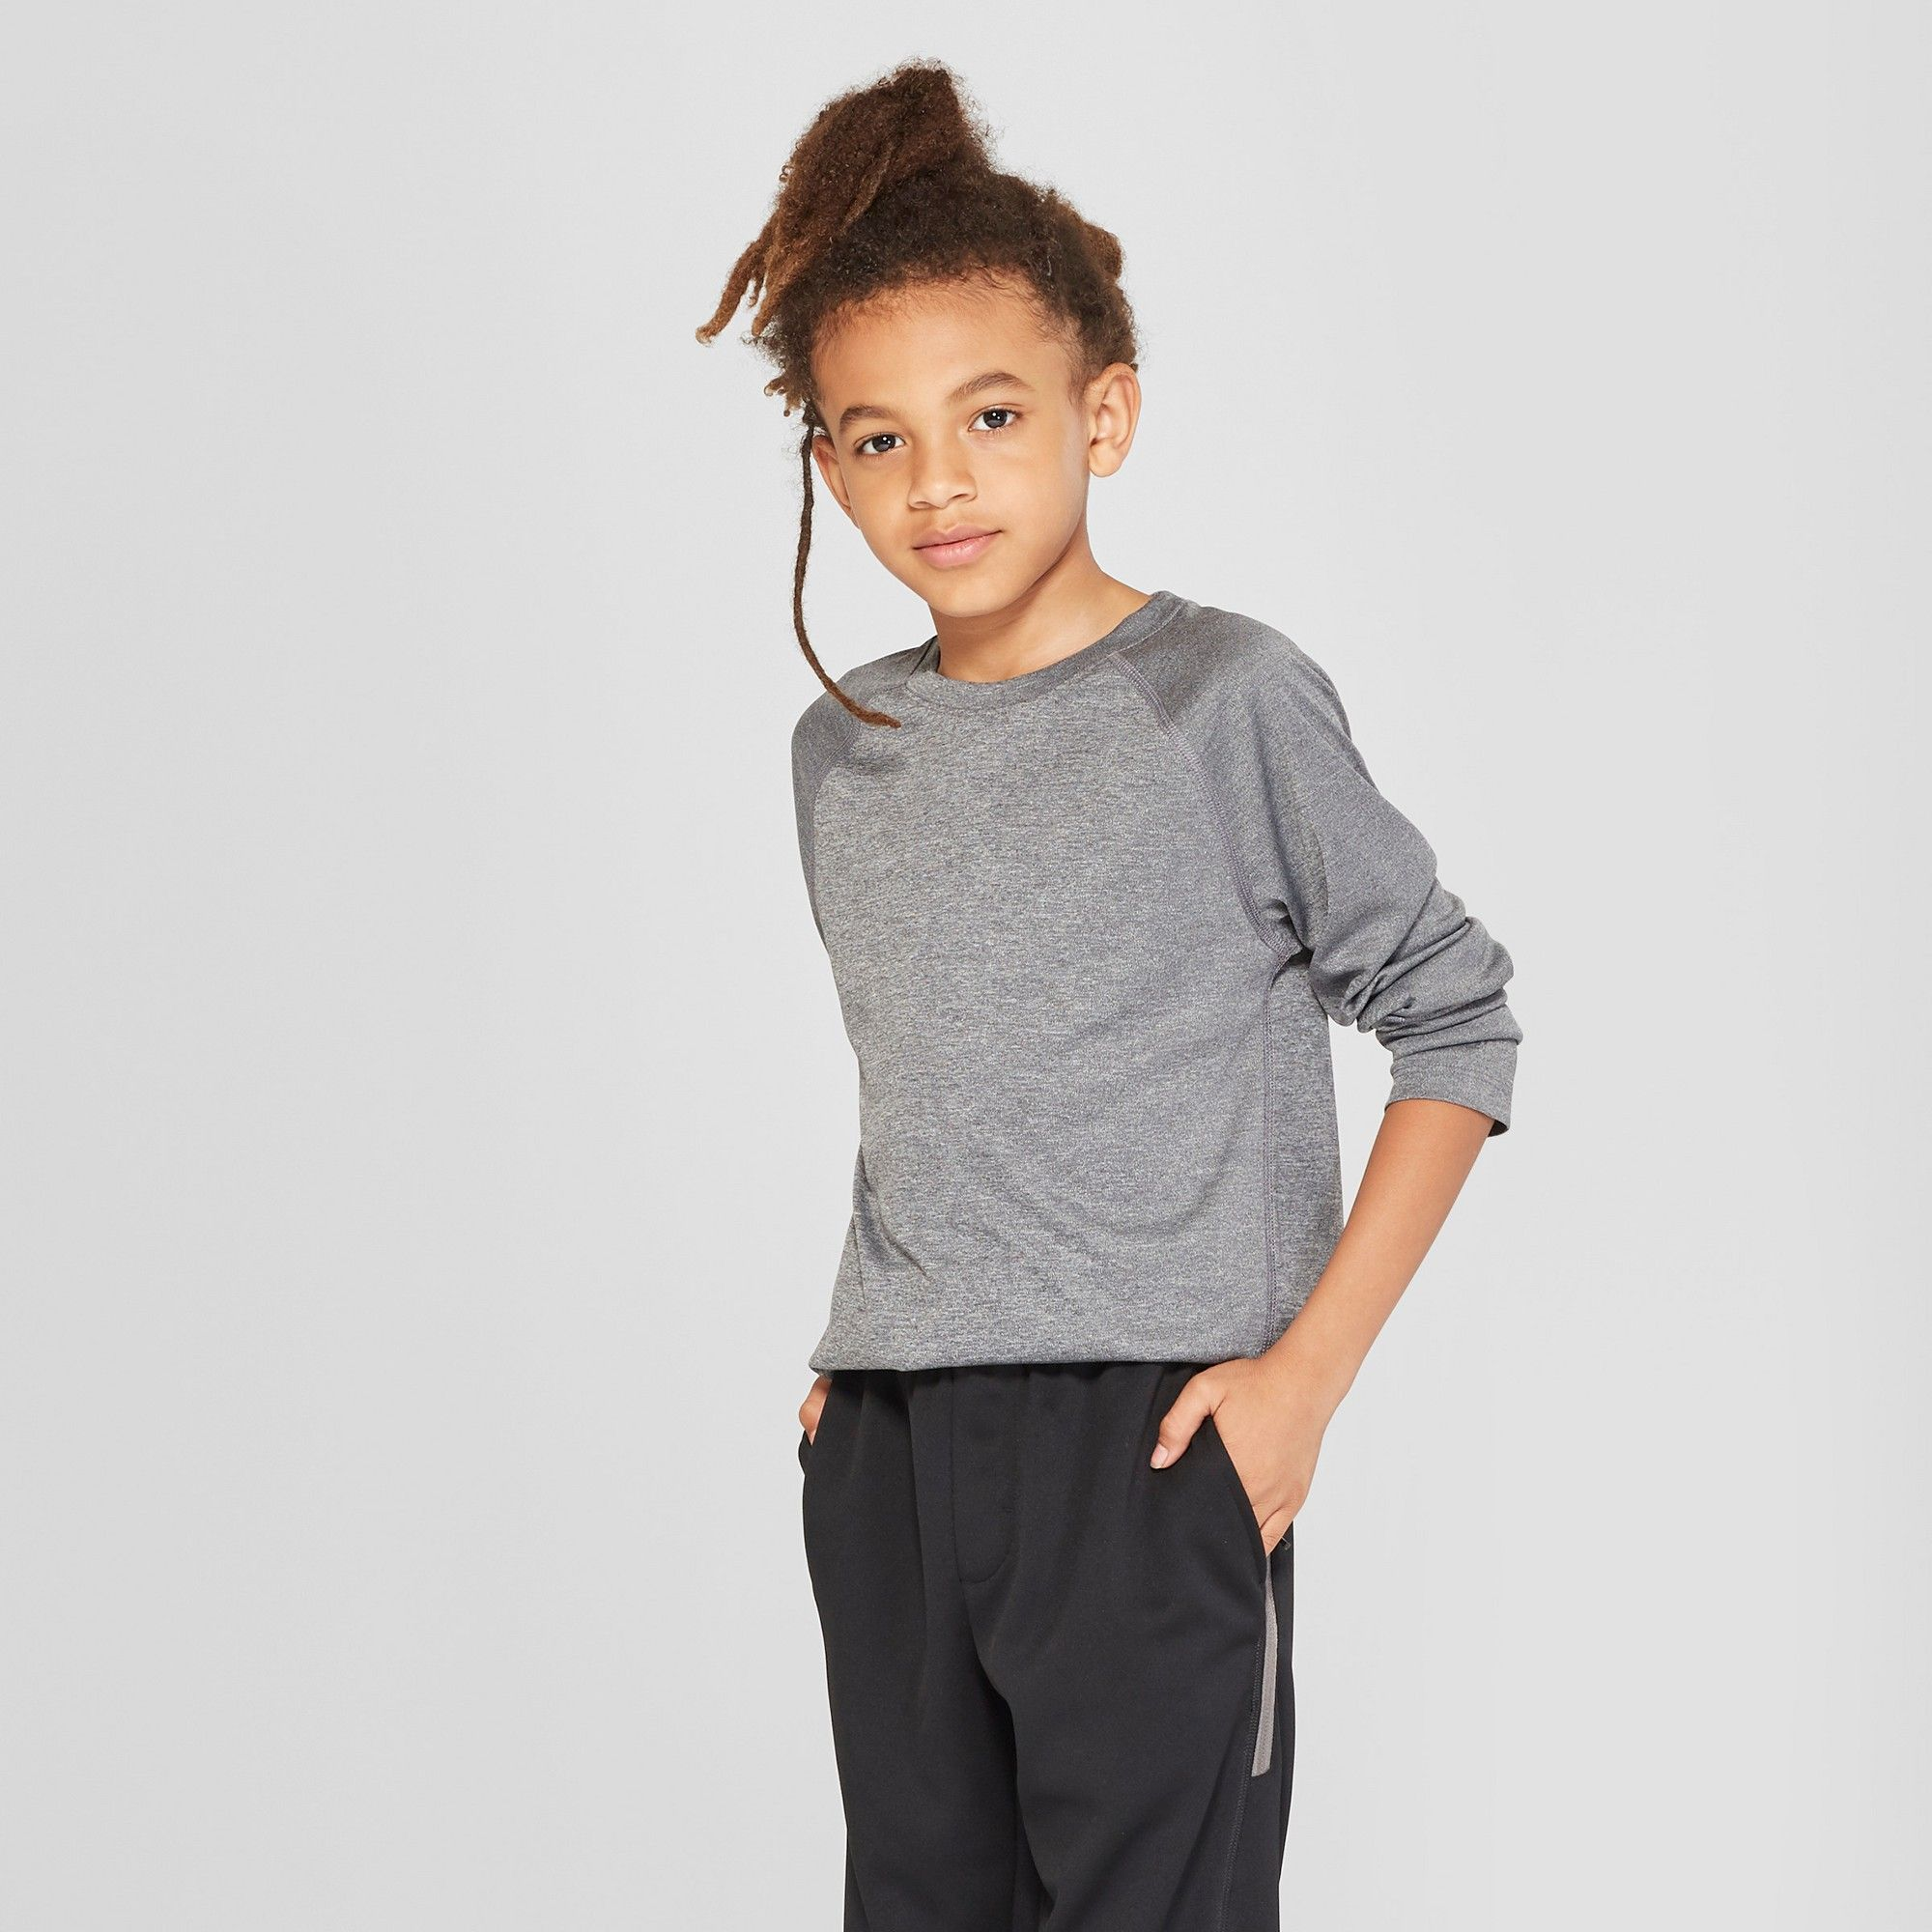 aa24ae92b887 Boys  Long Sleeve Tech T-Shirt - C9 Champion Black Heather XS